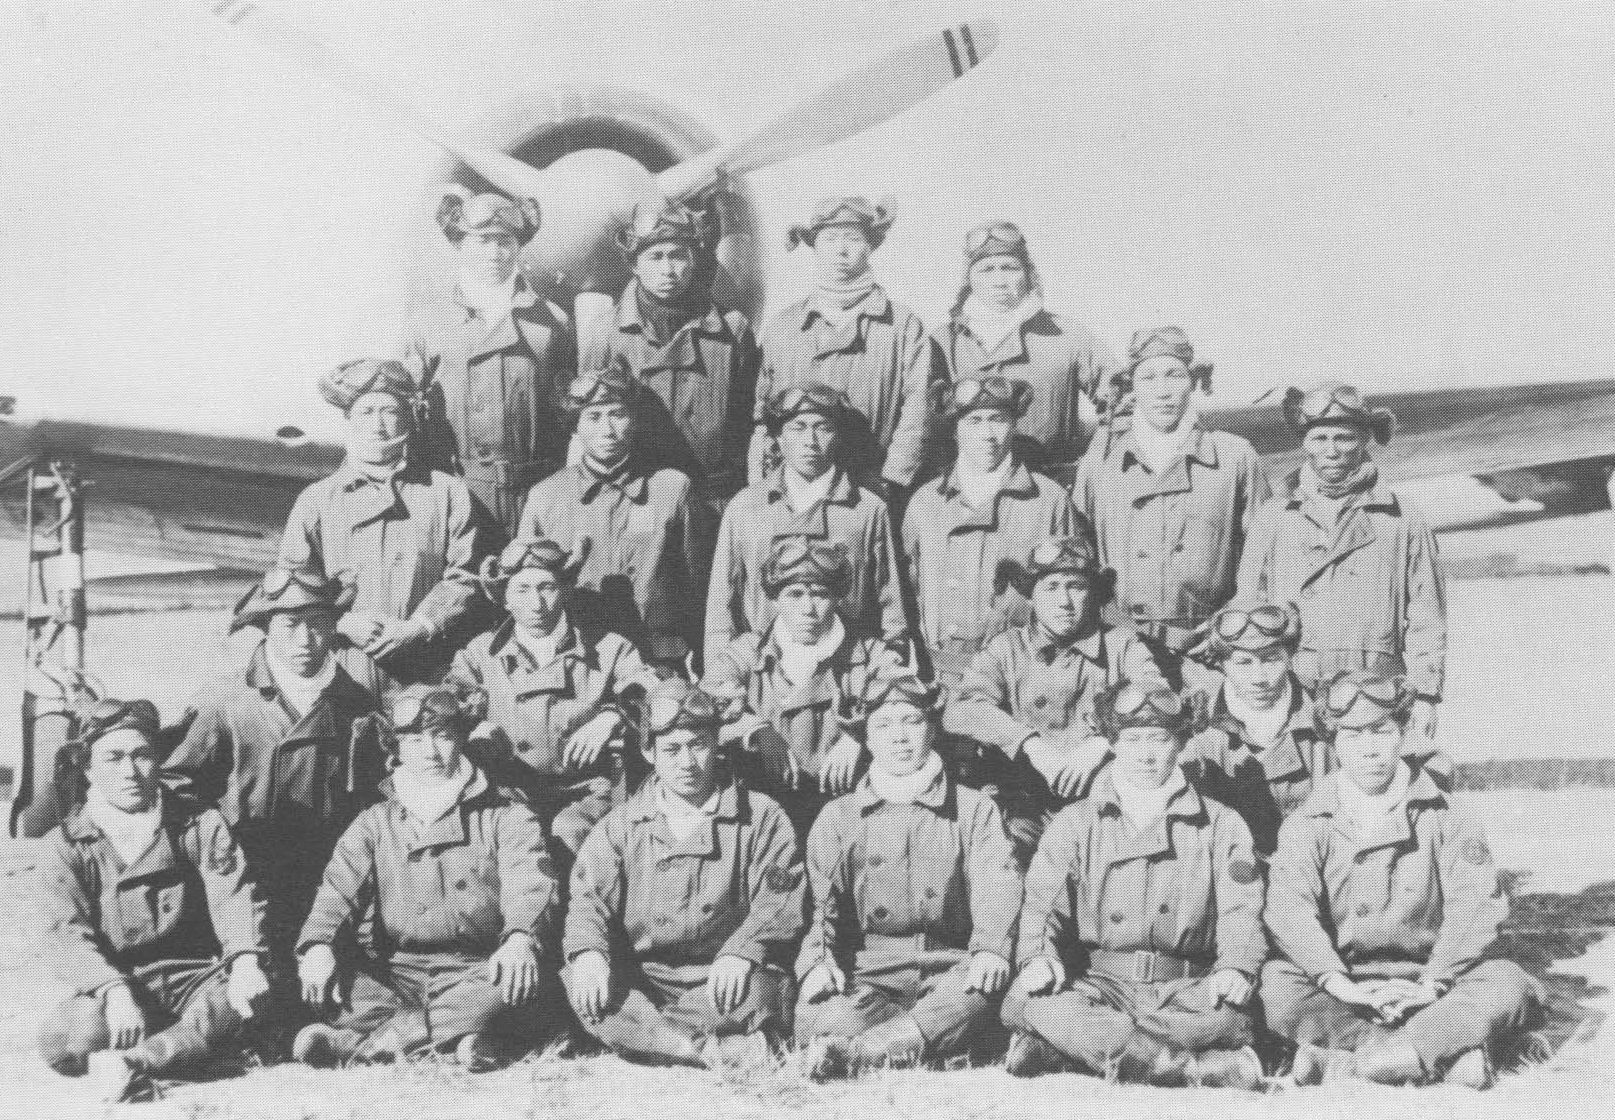 Photo Group Portrait Of Carrier Shokaku S Fighter Squadron Japan Oct Or Nov A6m Zero